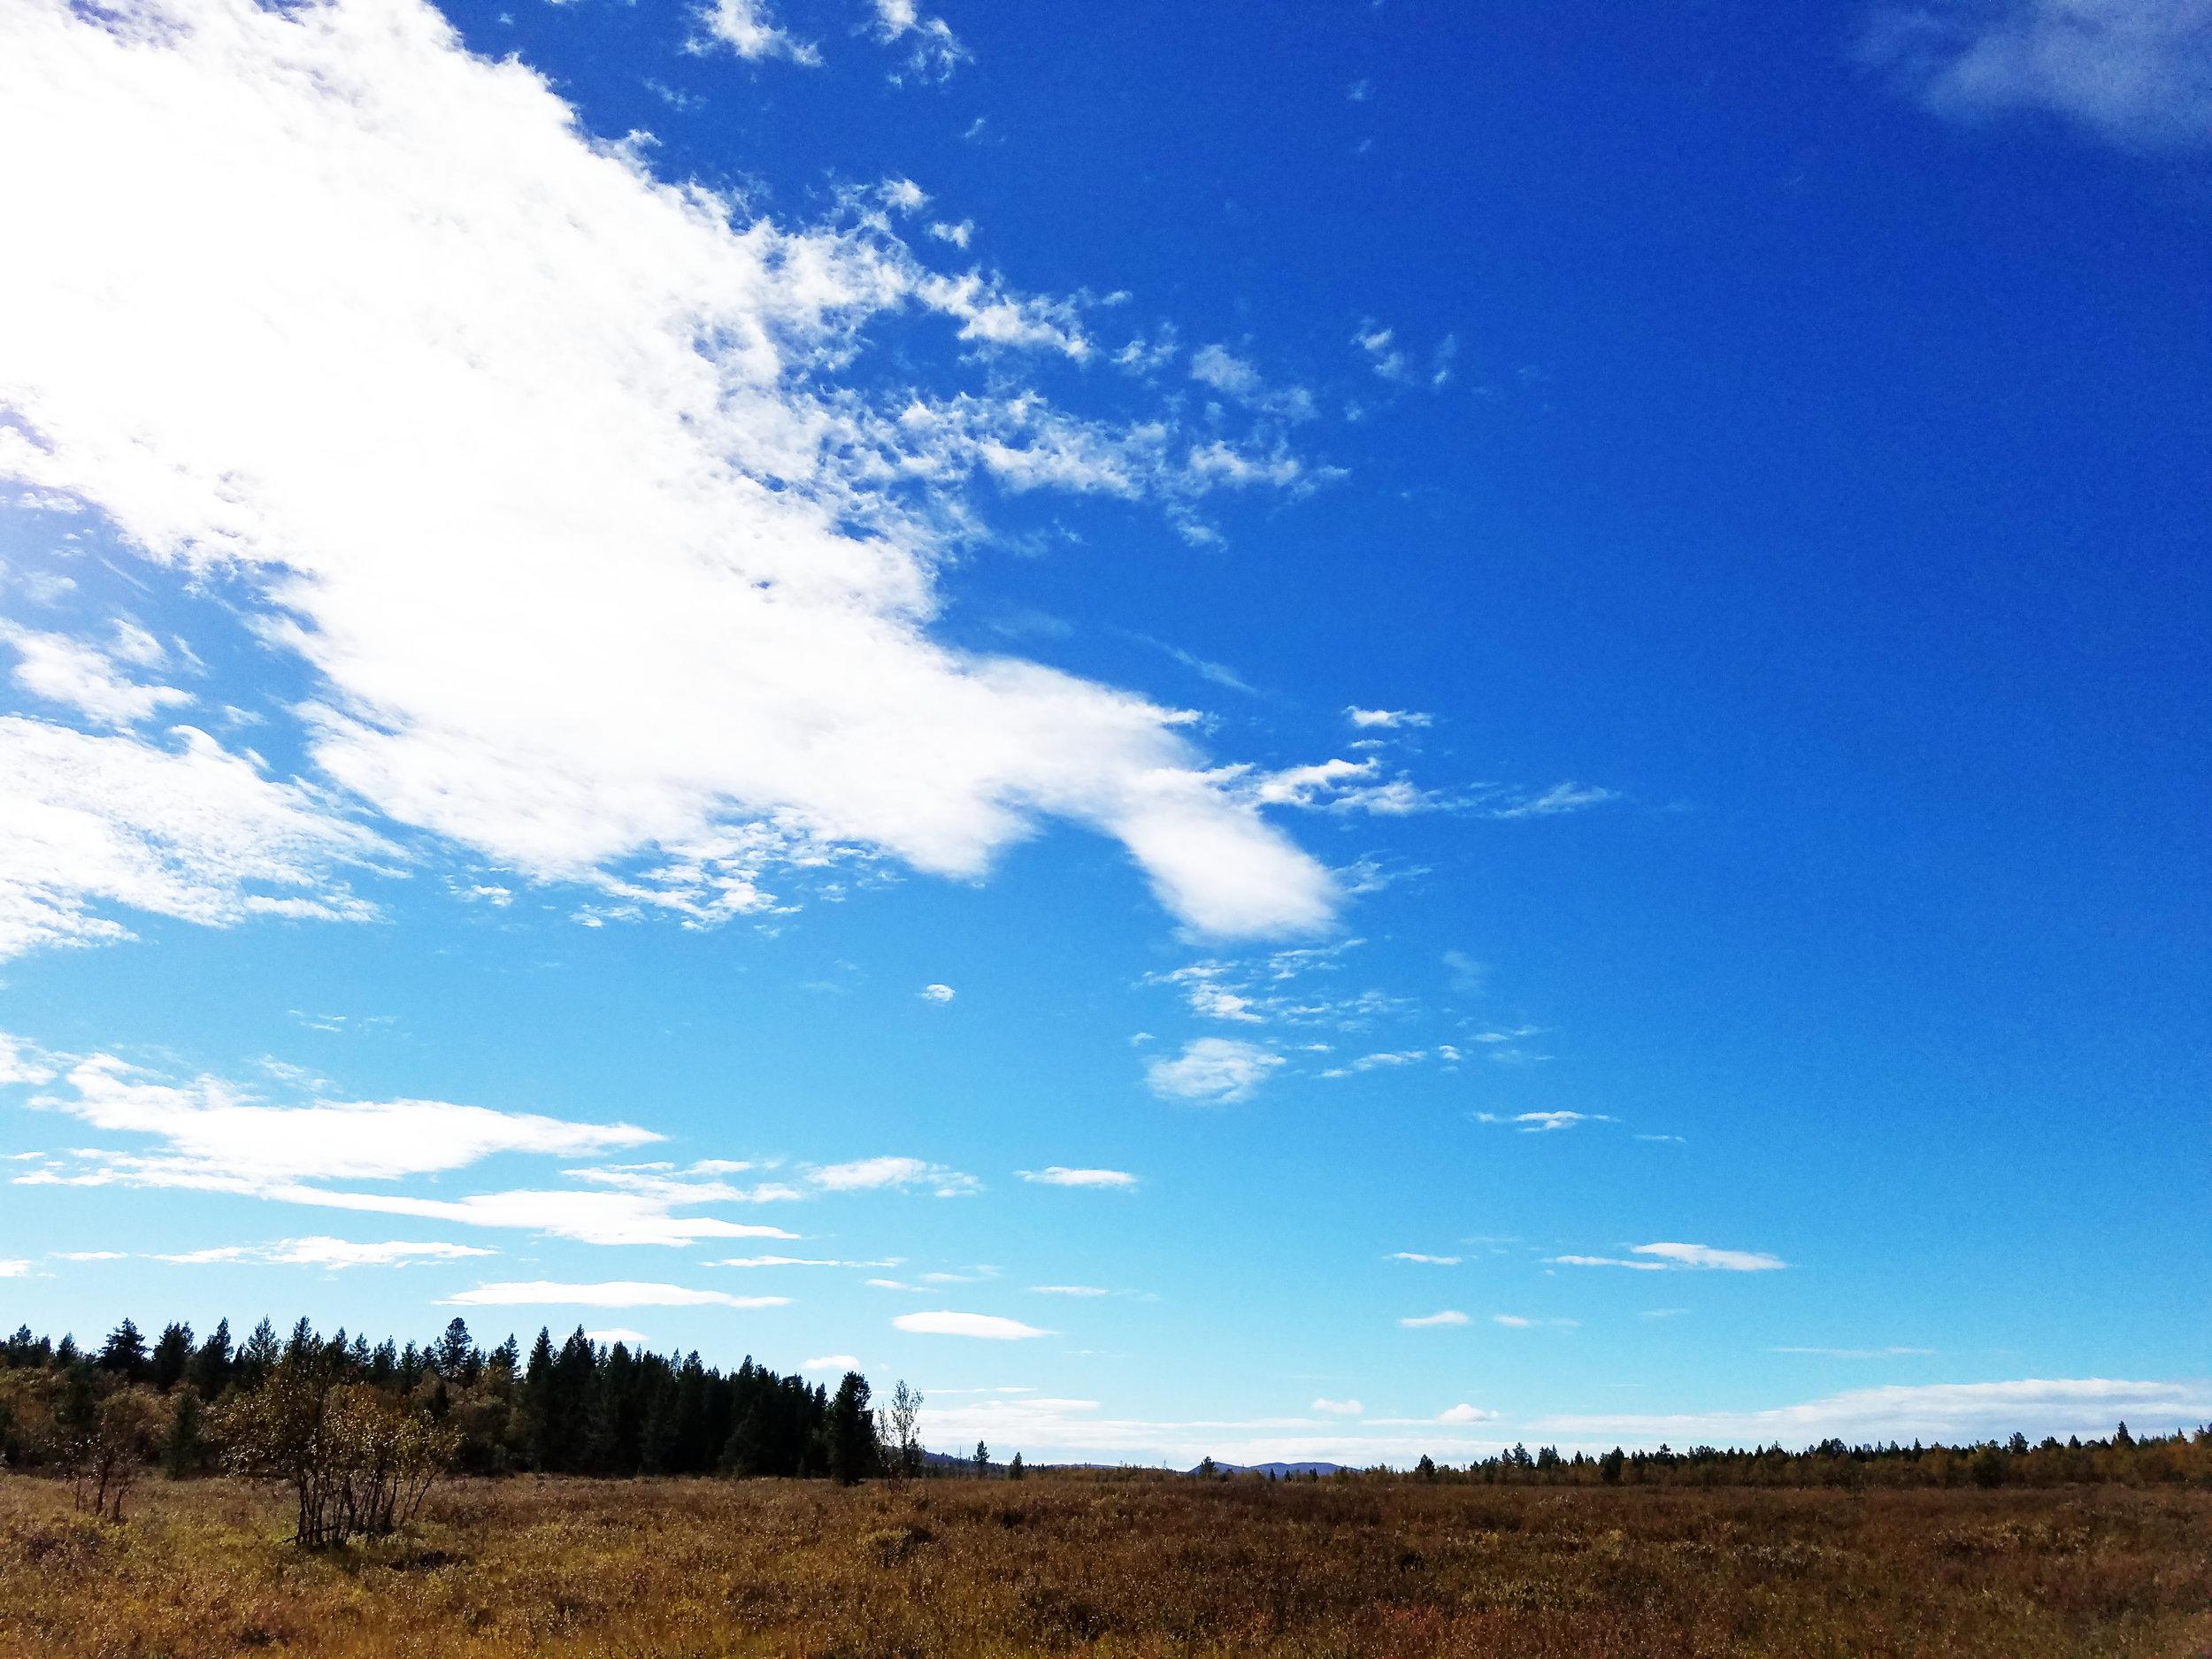 finland open wetland.jpg